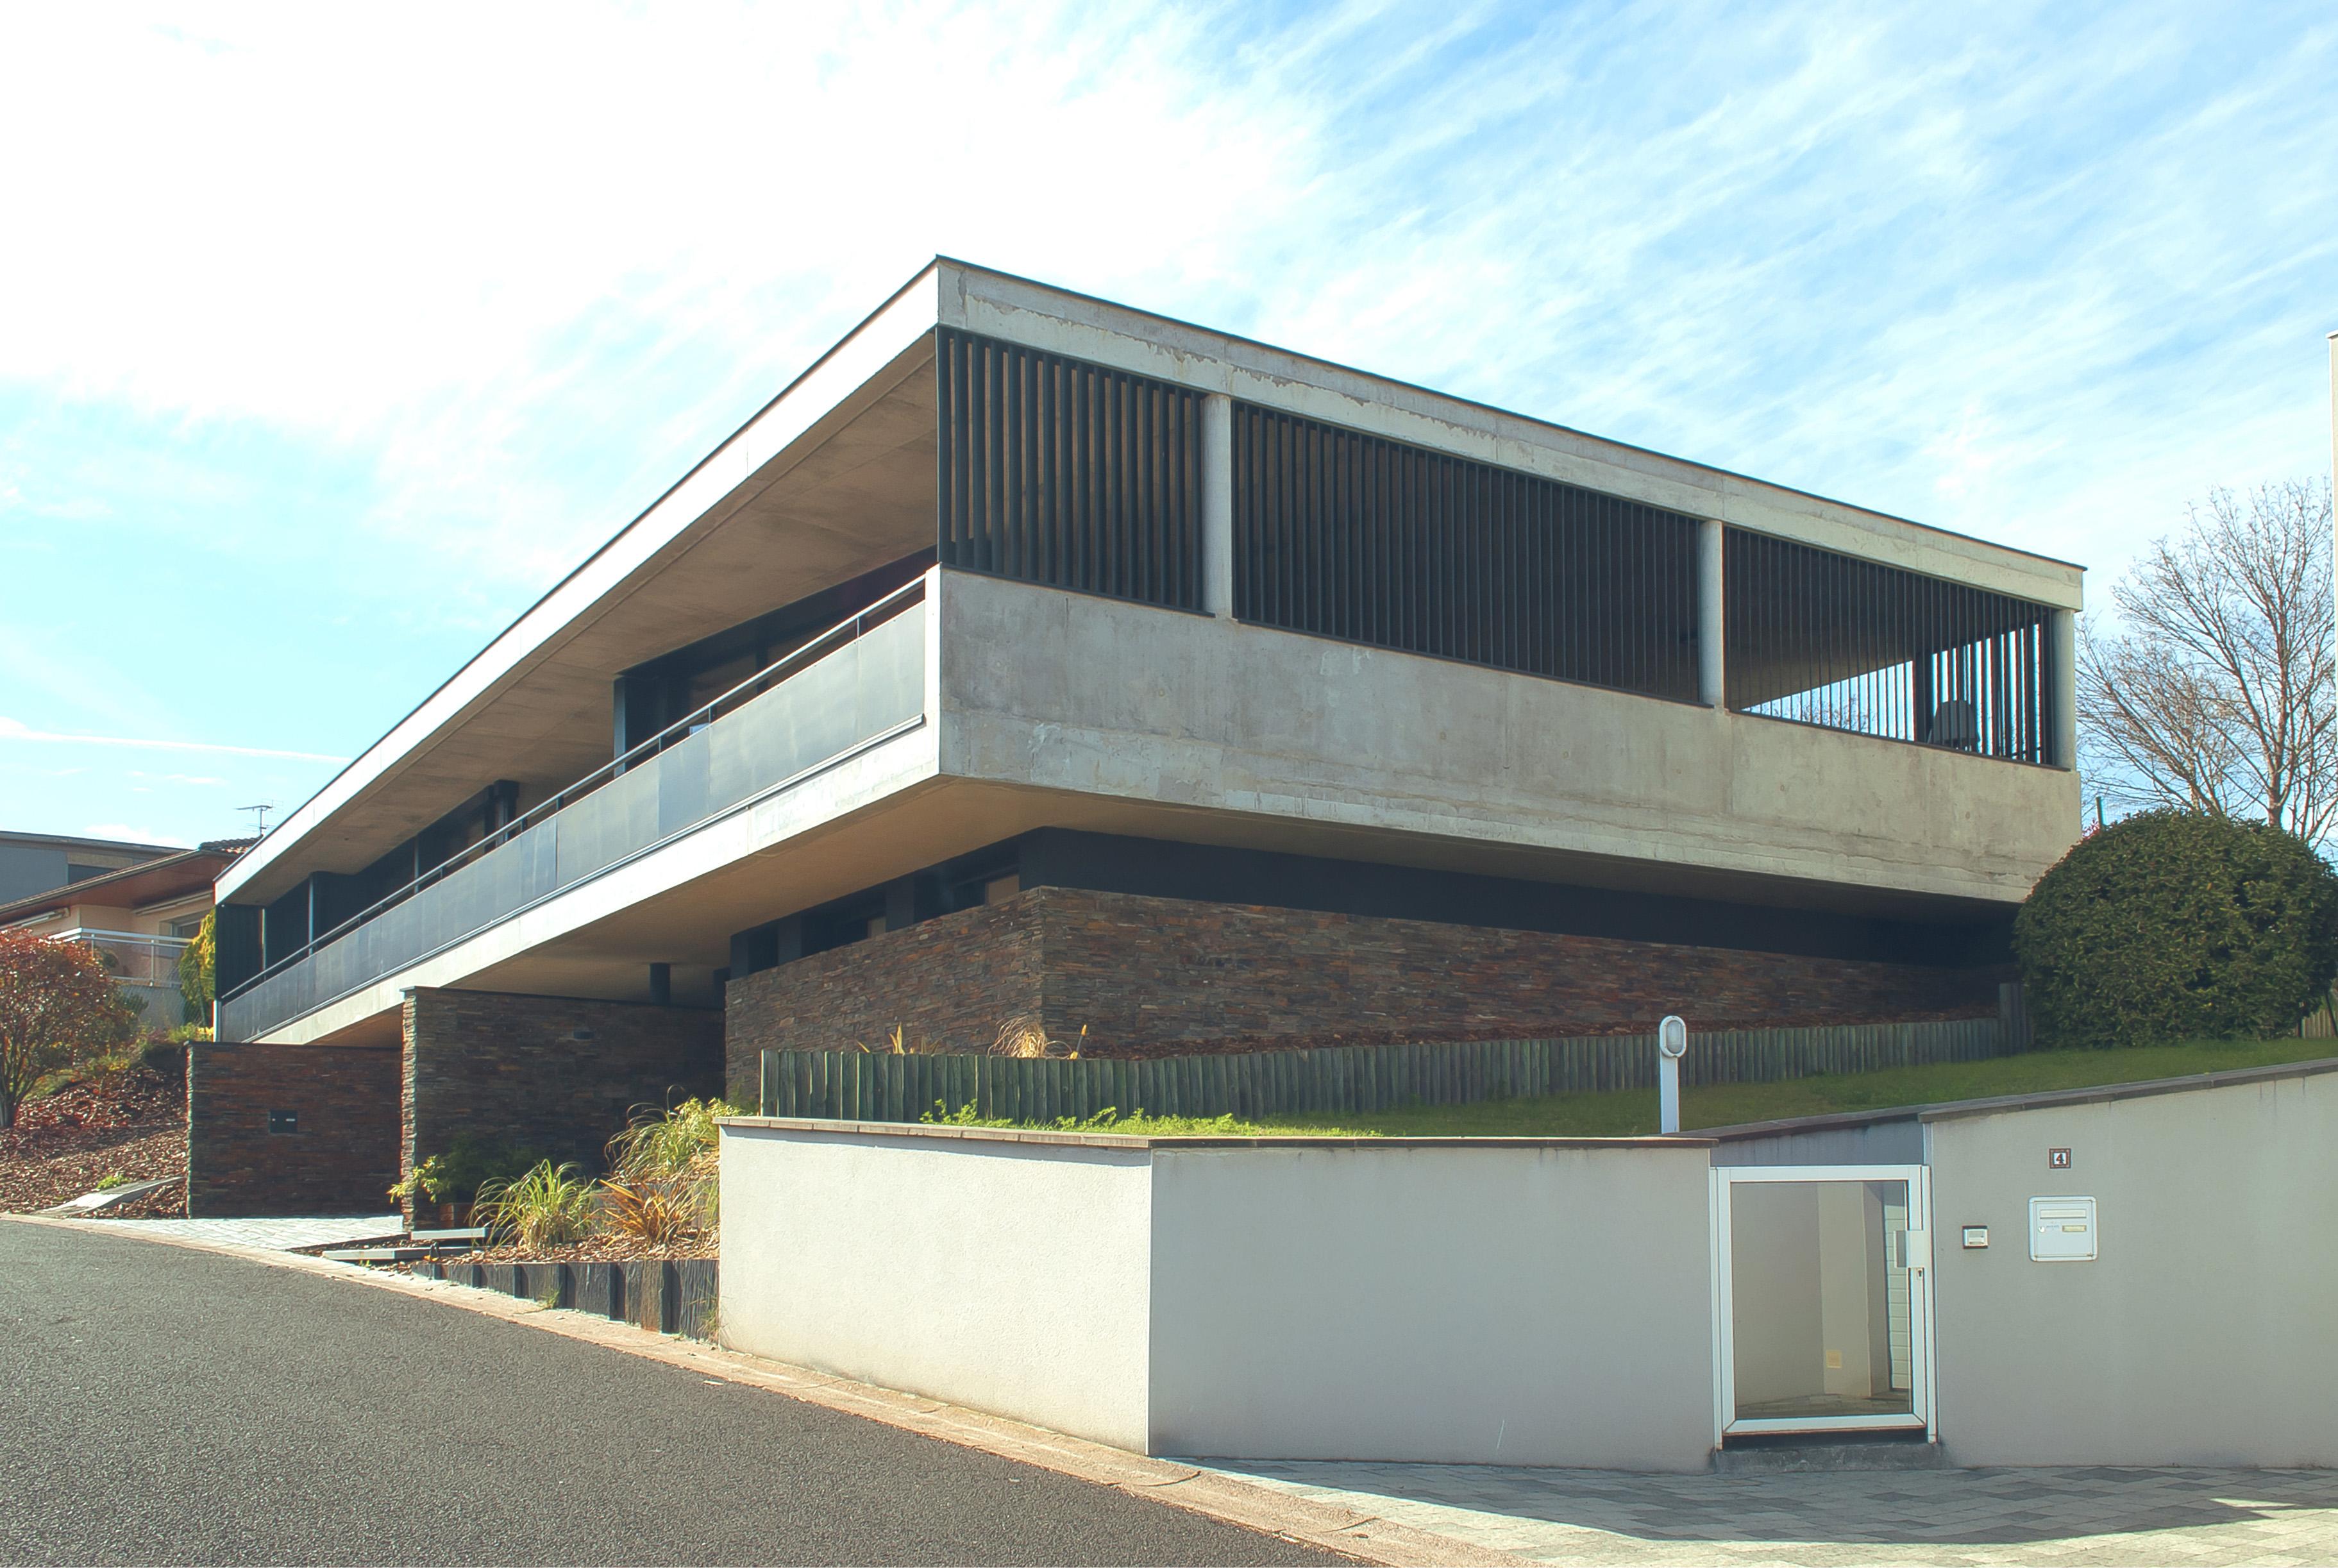 Gkl Architectes / Cle